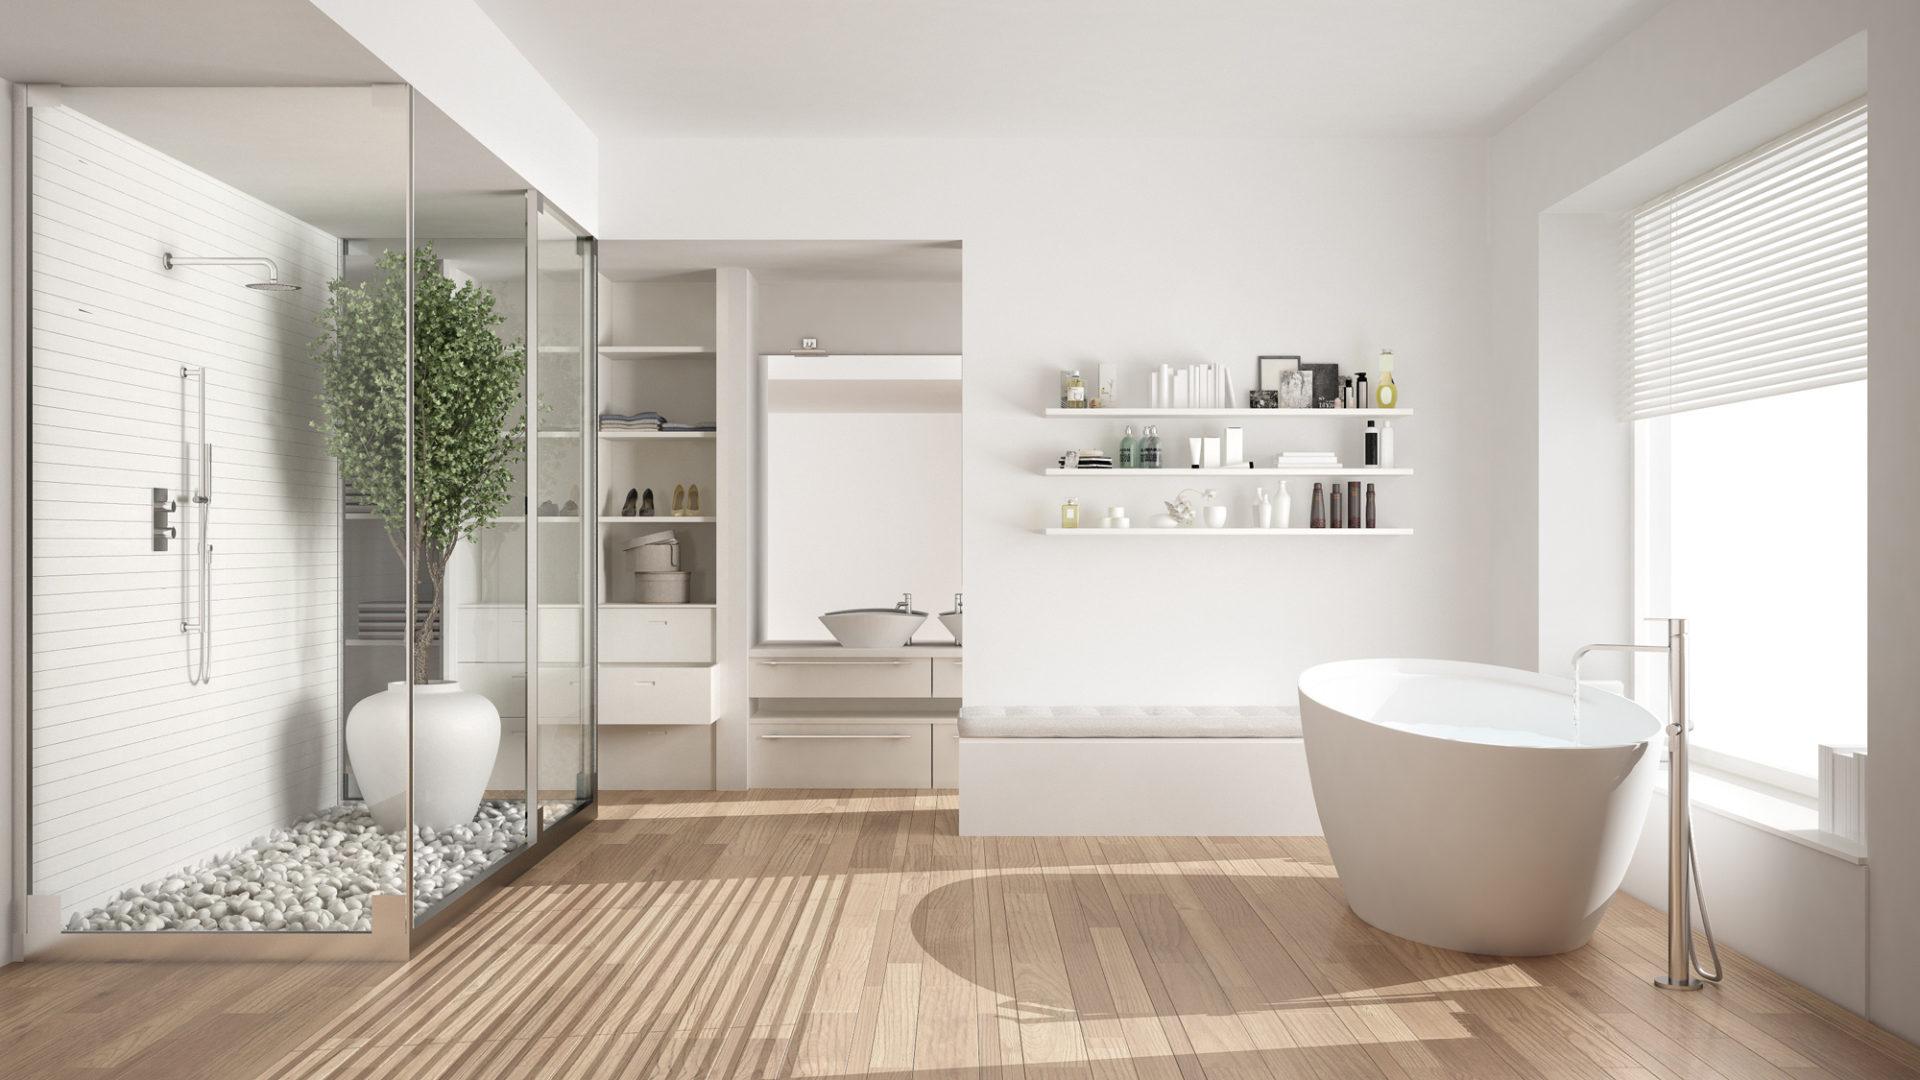 bathroom-renovated-1920x1080